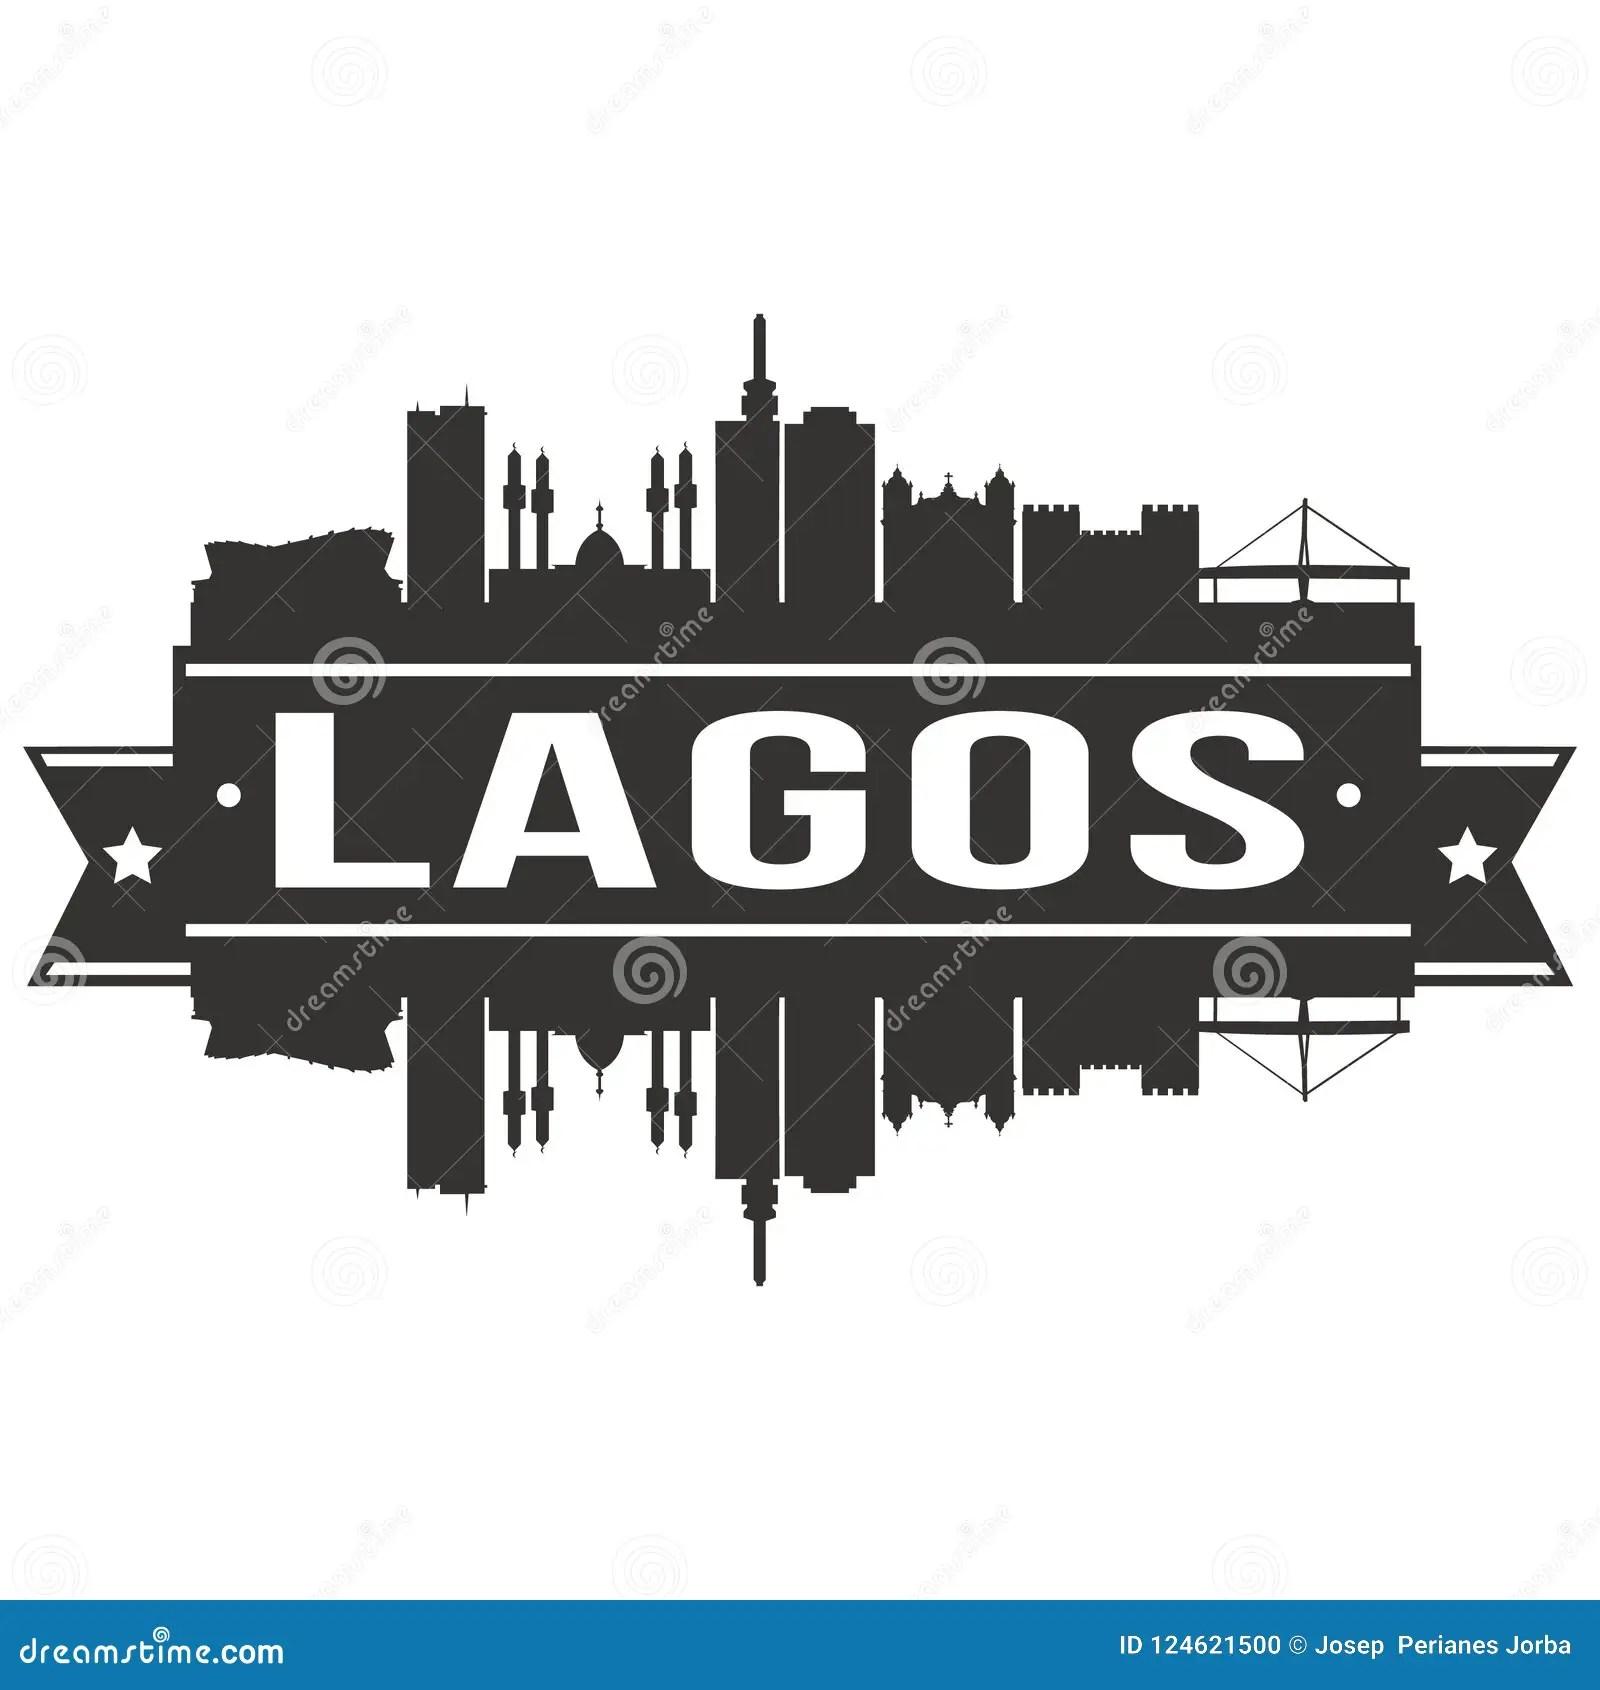 Lagos Nigeria Round Icon Vector Art Flat Shadow Design